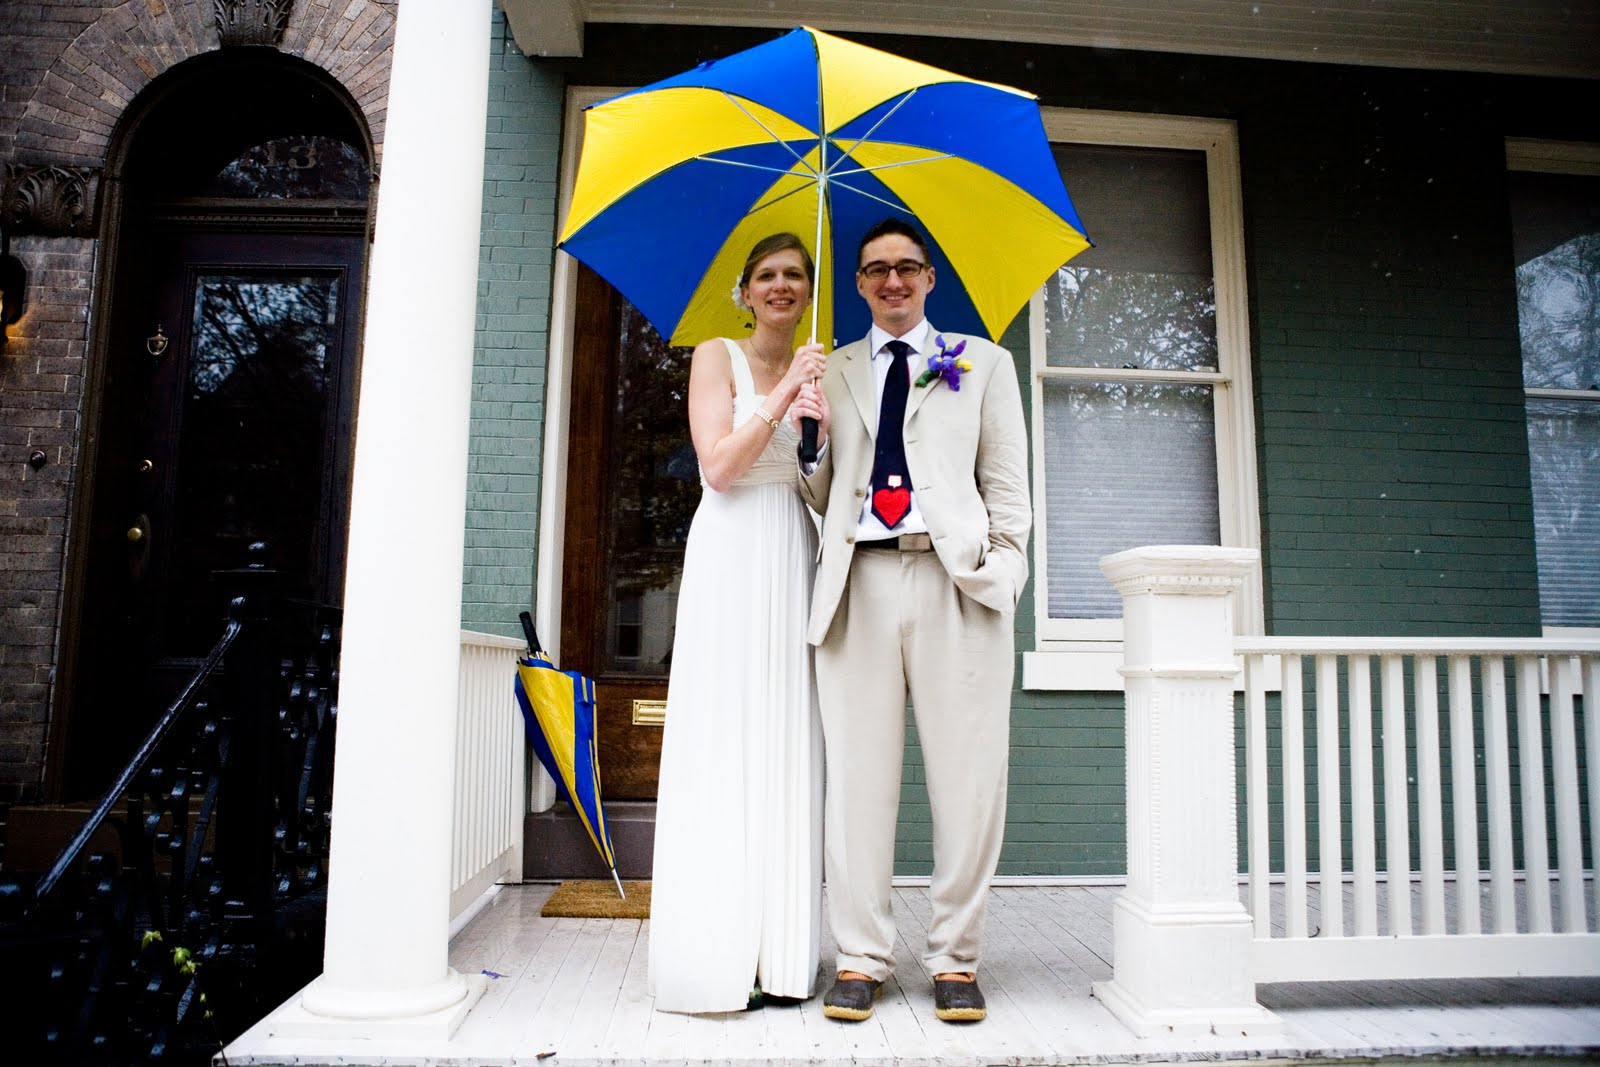 2000 Dollar Budget Wedding: Guest Post: Weathering Wedding